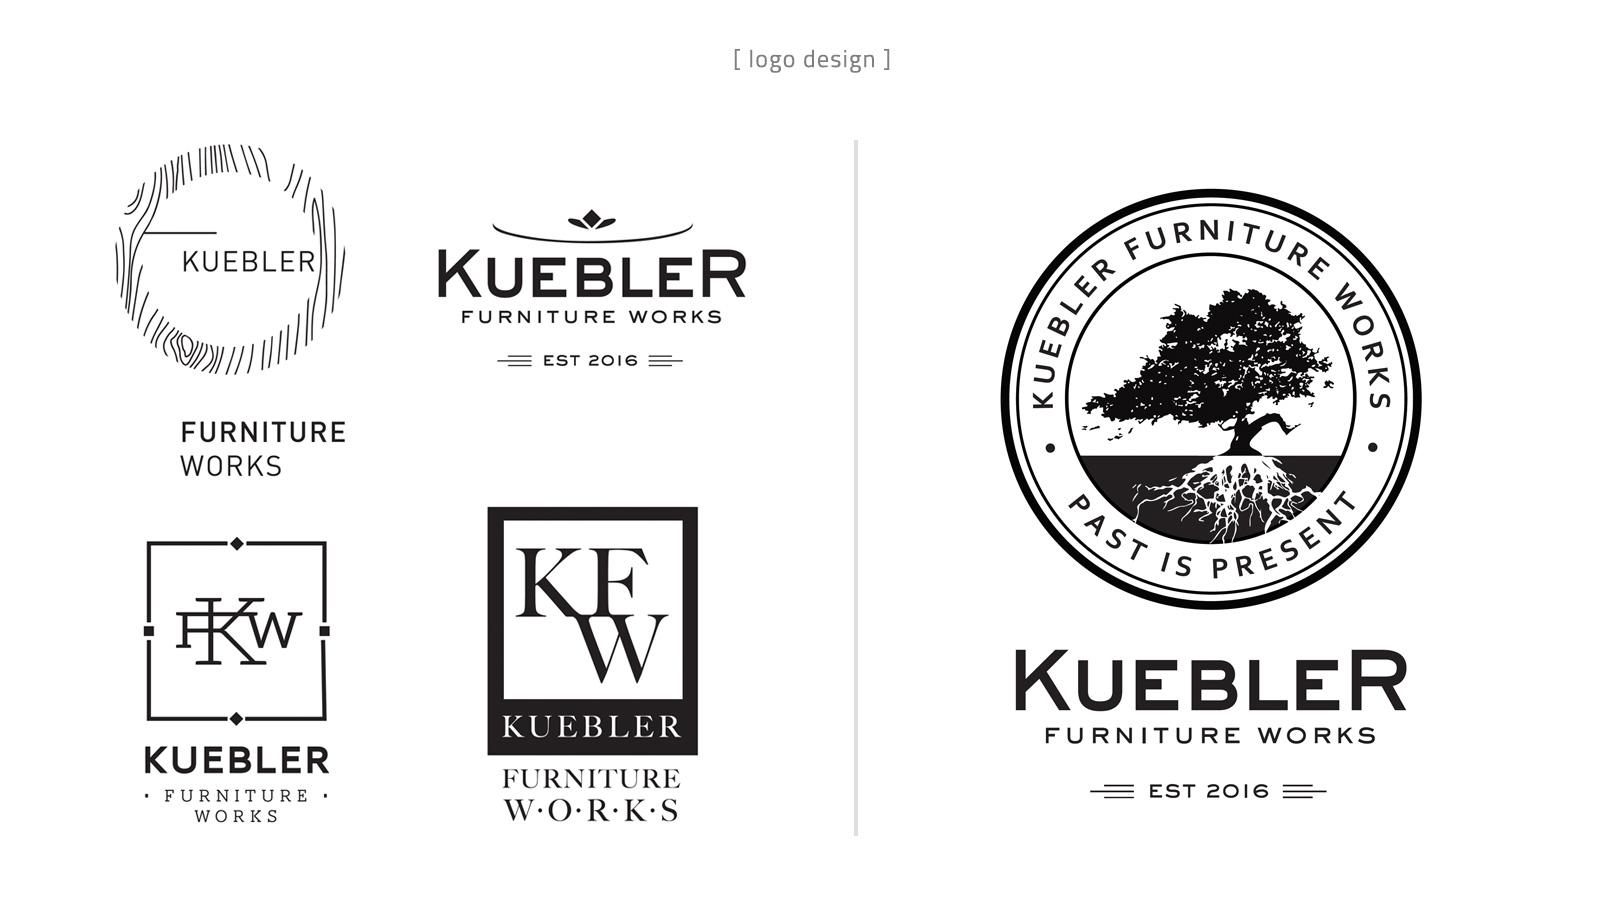 work_kfw-logo